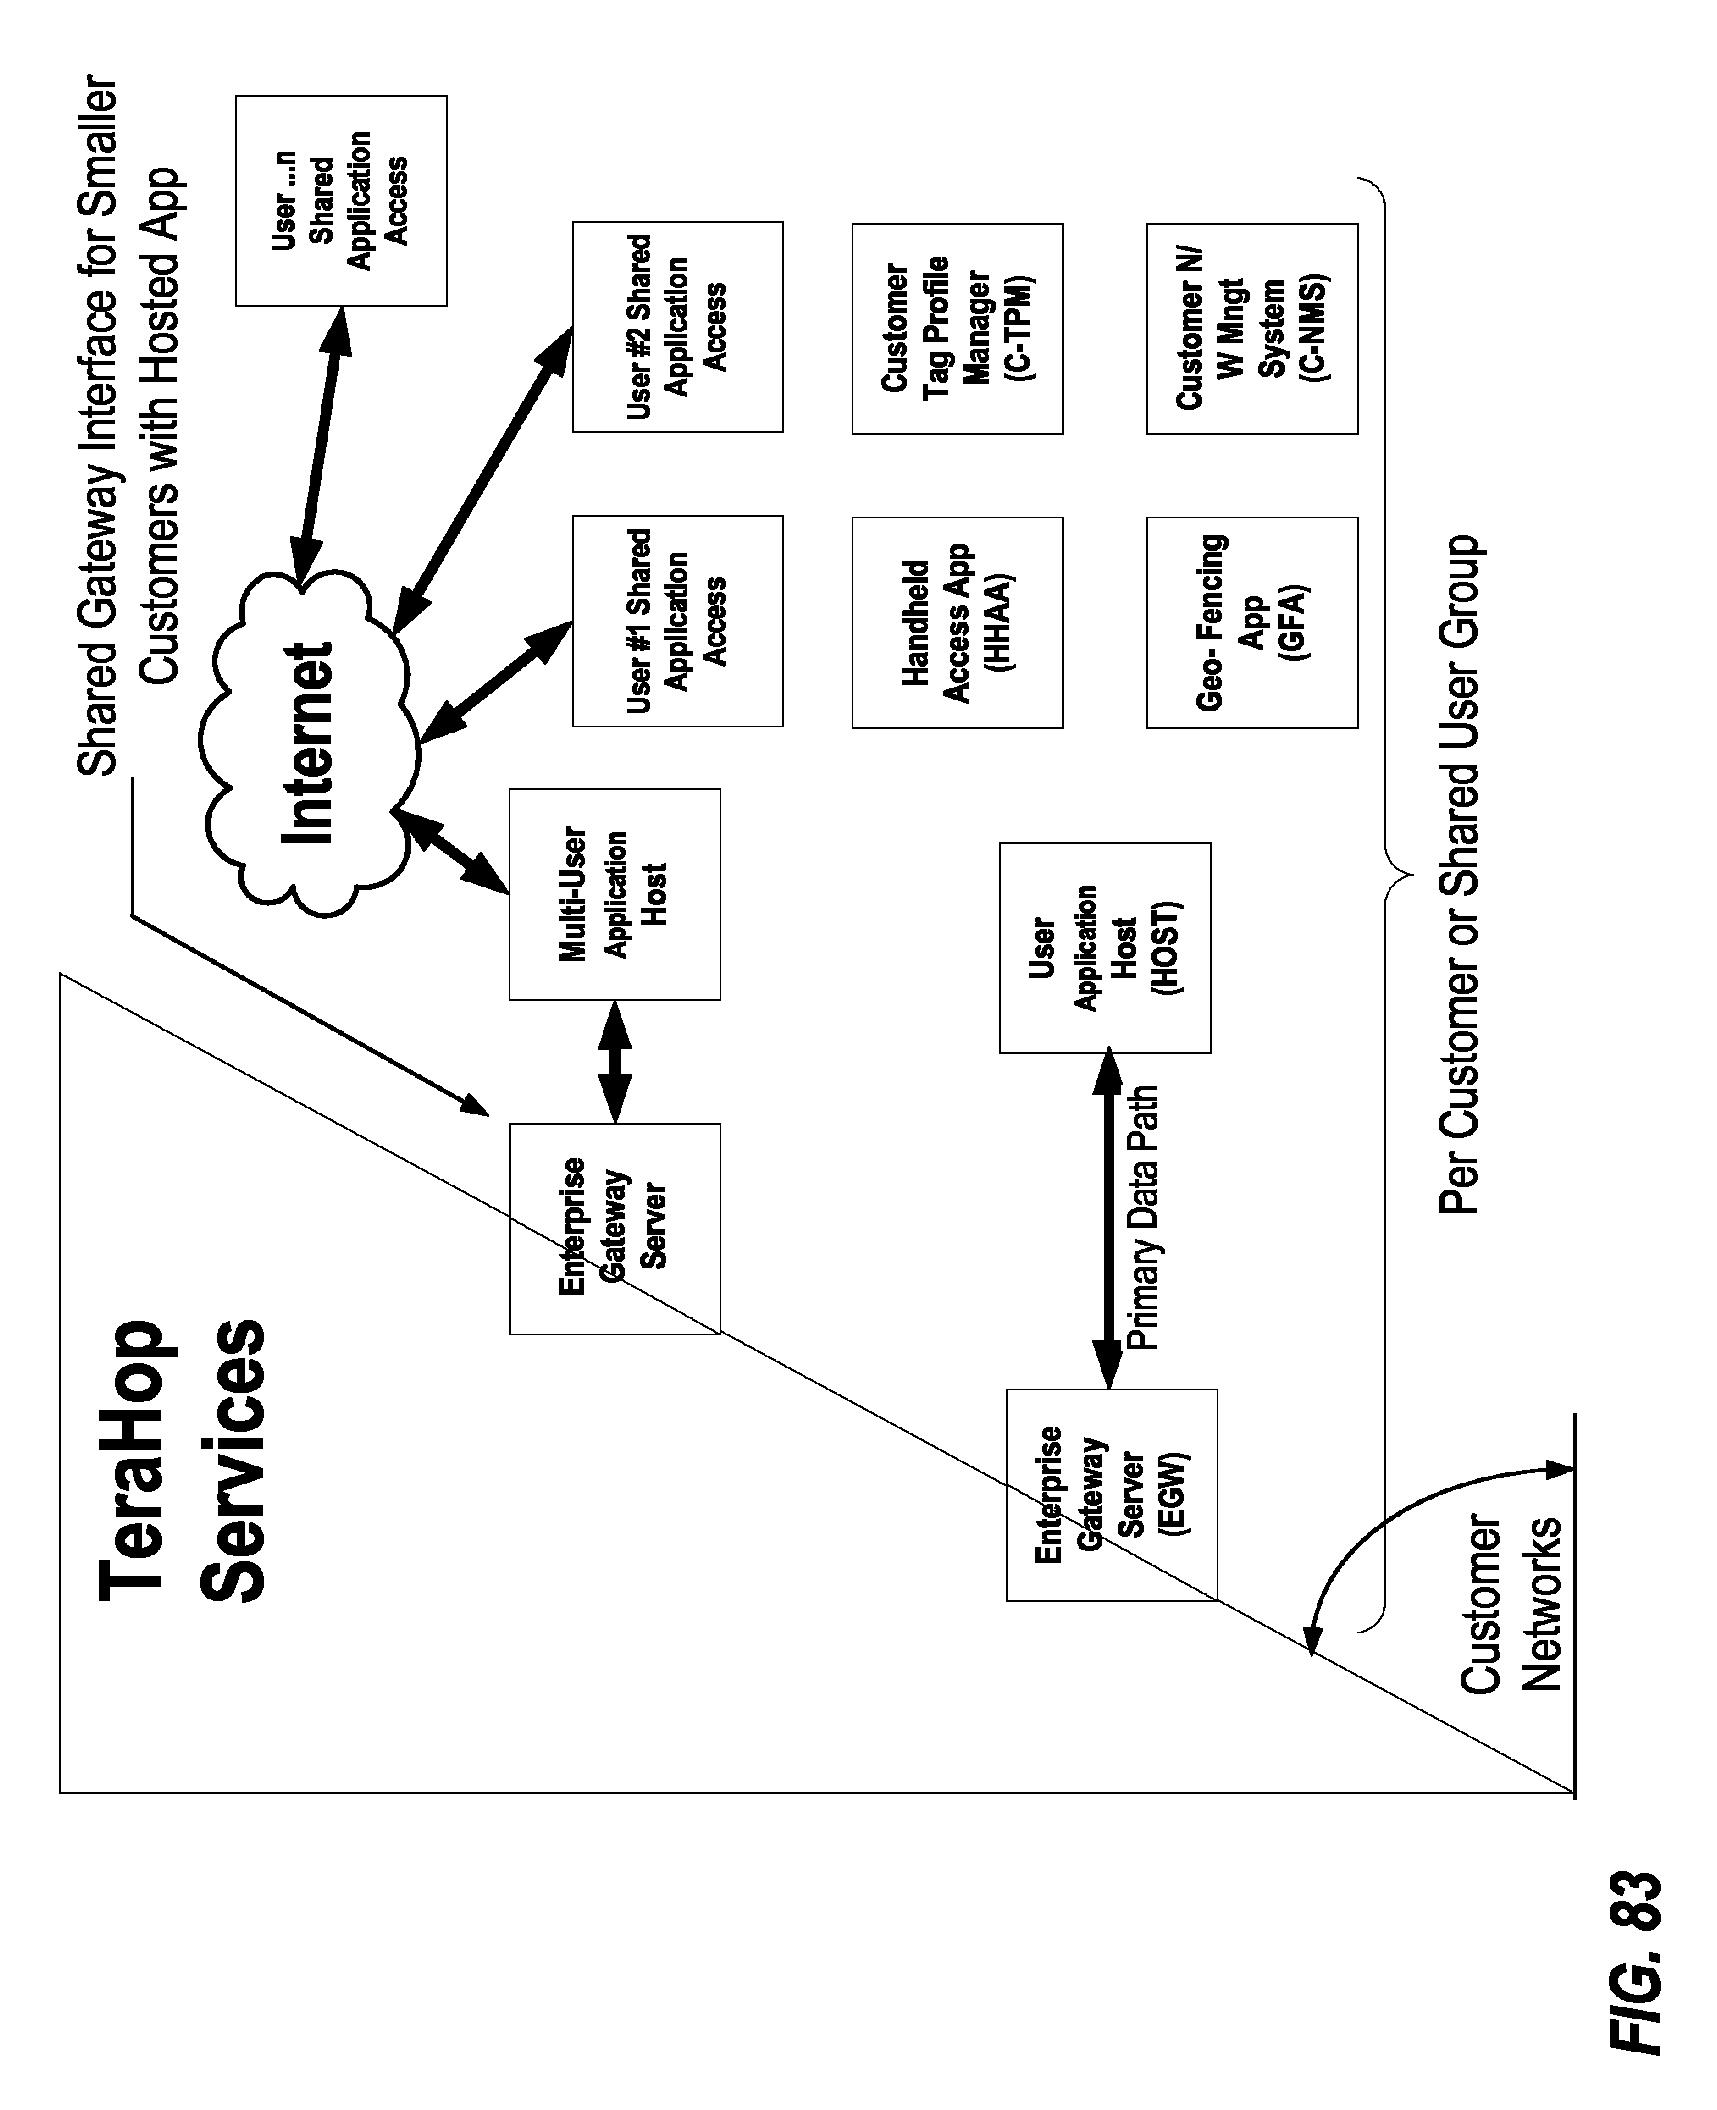 Patent US 8,279,067 B2